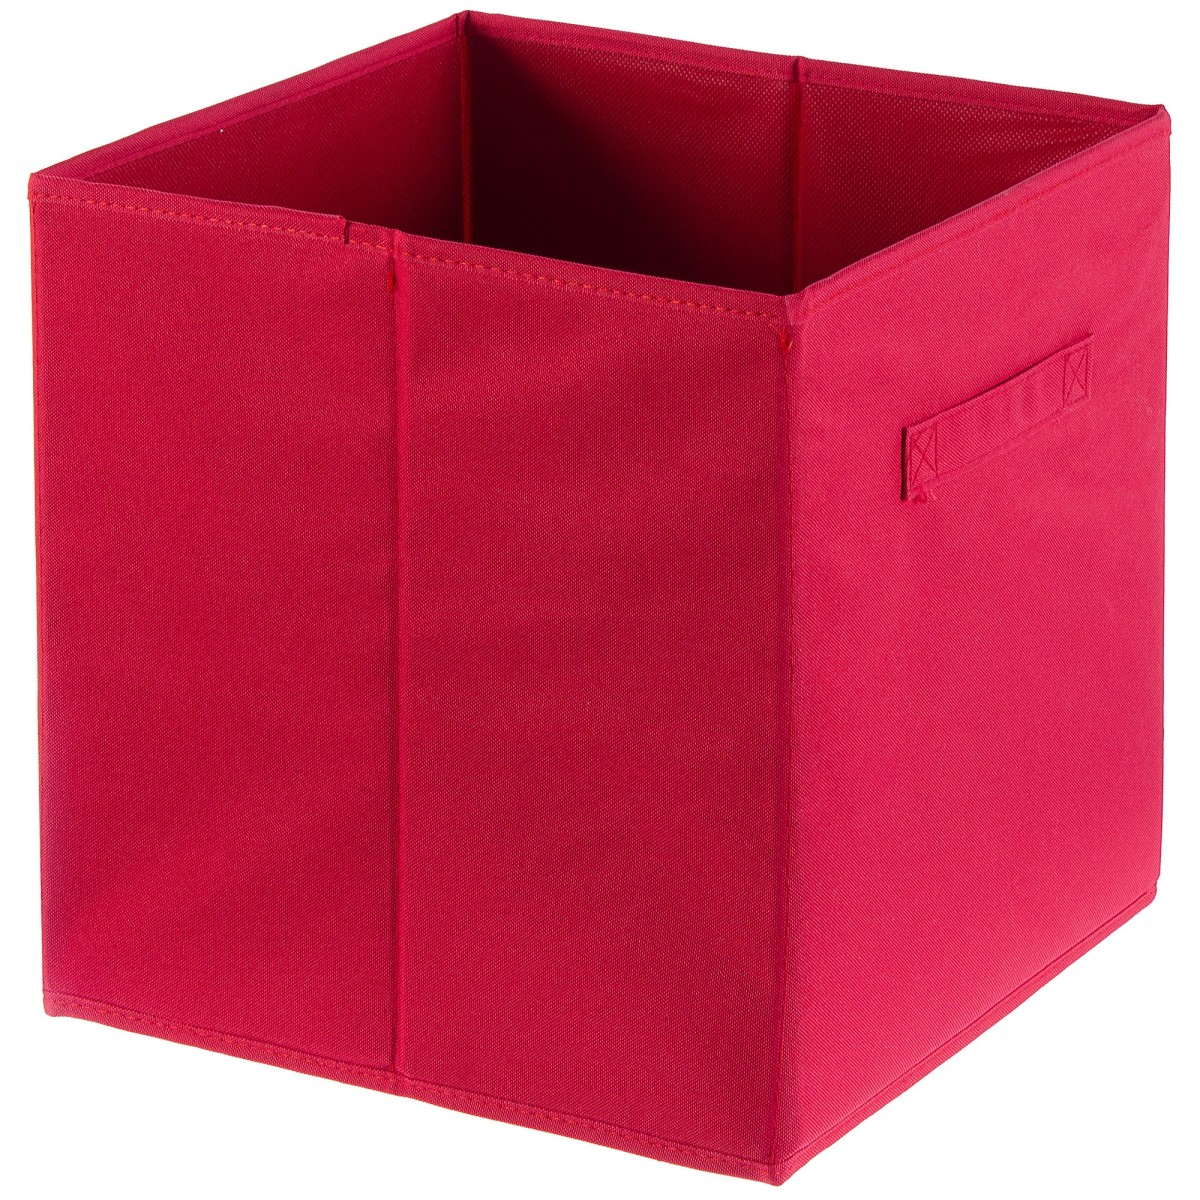 Короб Spaceo 310x310x310 мм 29.7 л полиэстер цвет красный